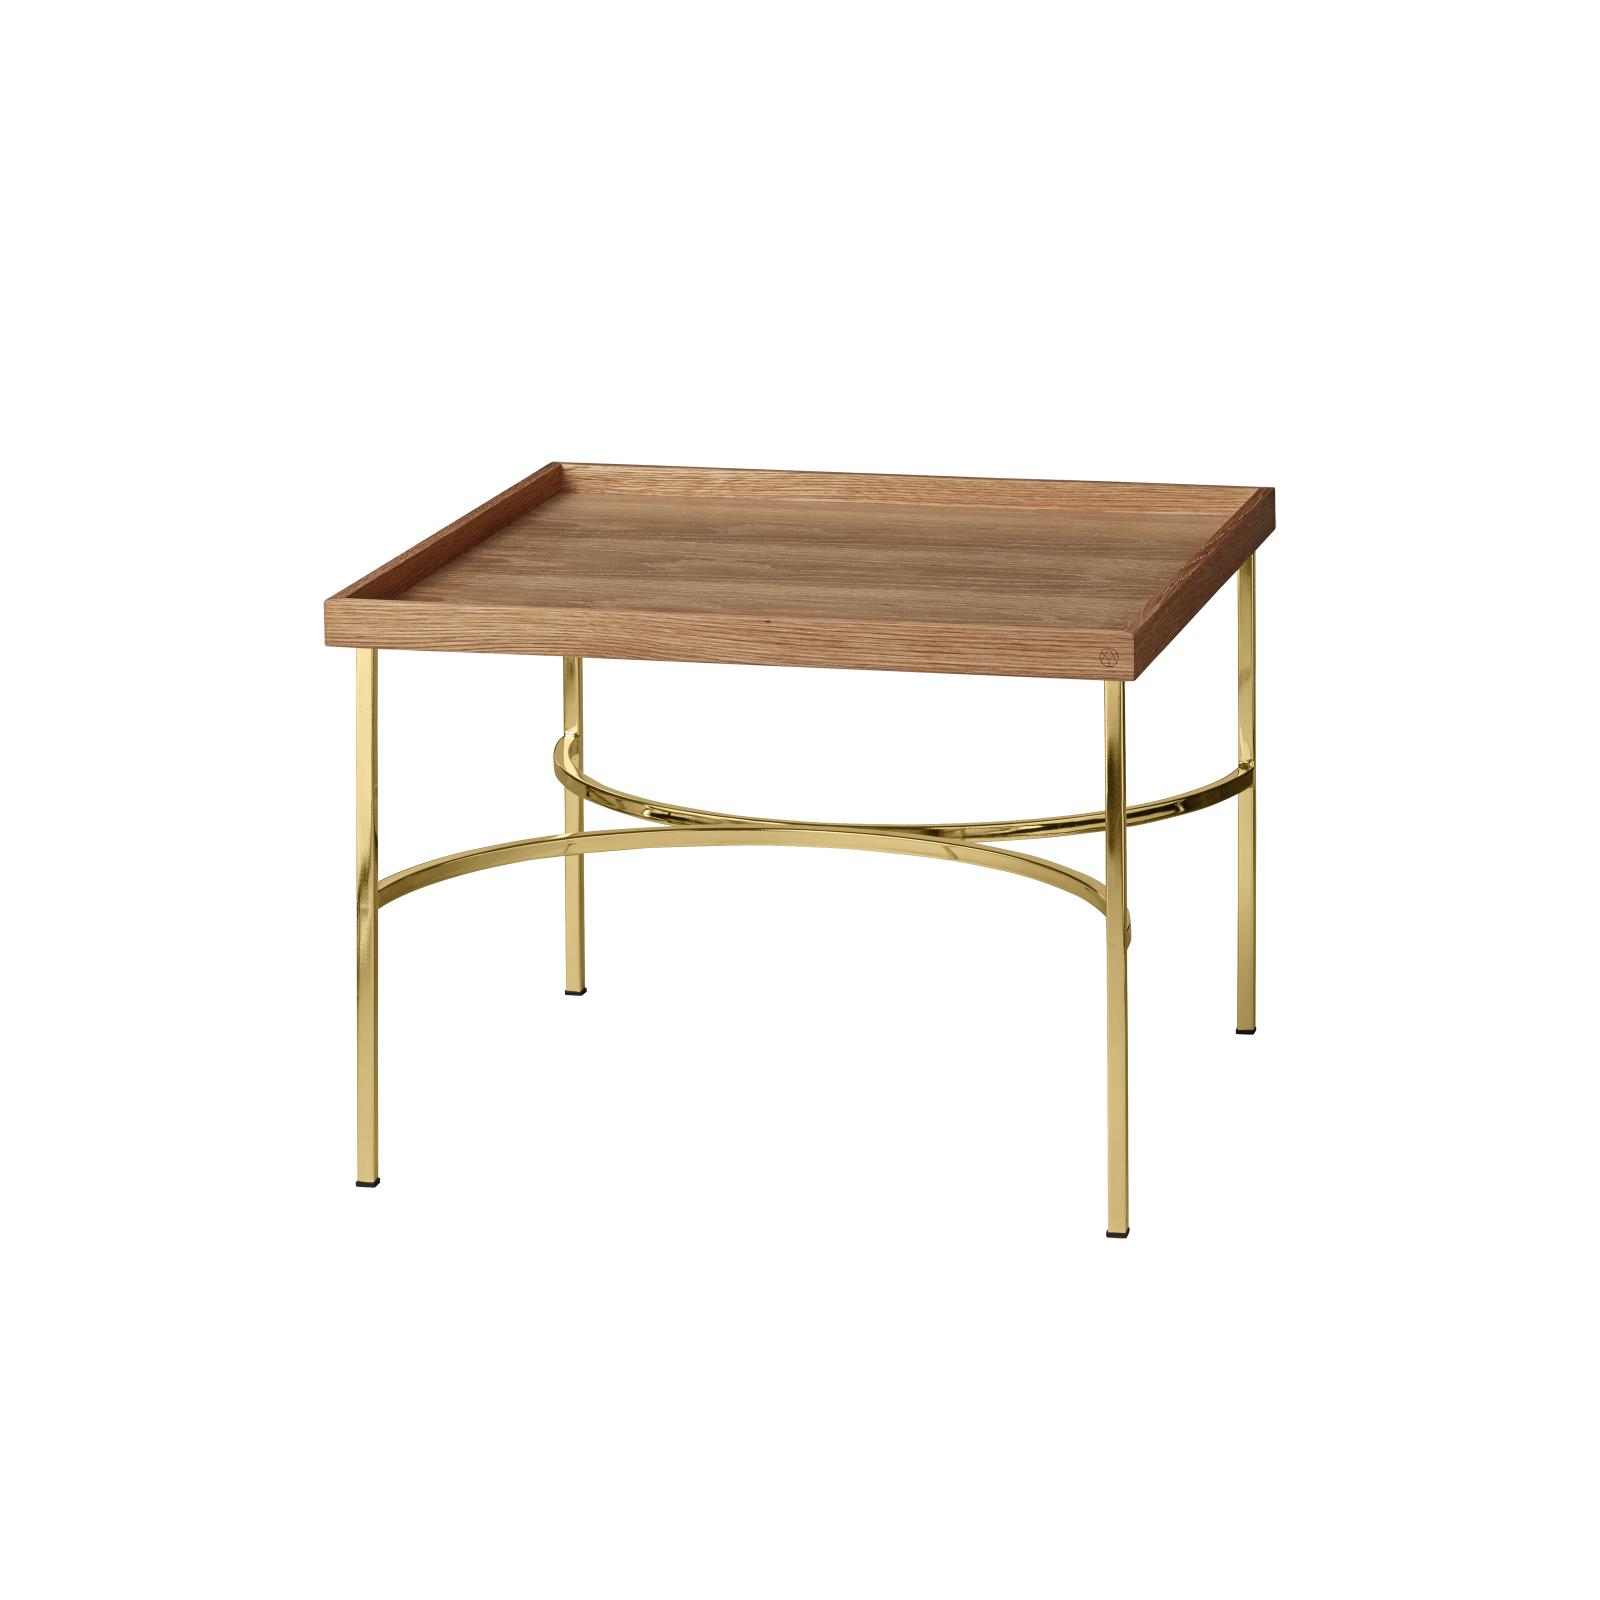 Bord UNITY table ek/ guld, AYTM